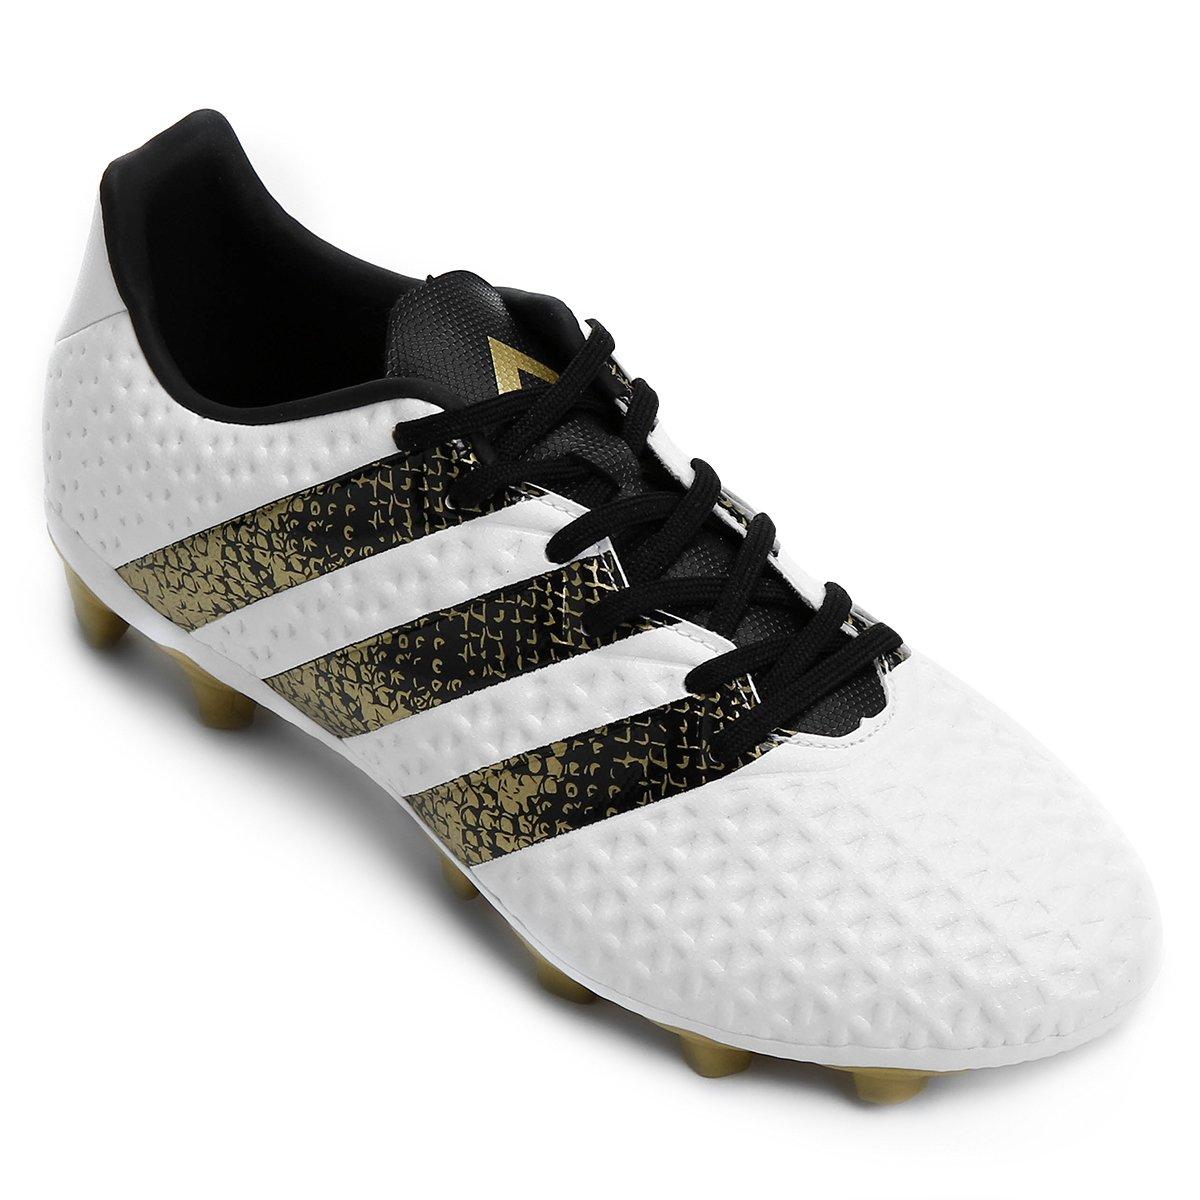 Chuteira Campo Adidas Ace 16.4 FXG Masculina - Branco e Preto ... e4d842b2defac